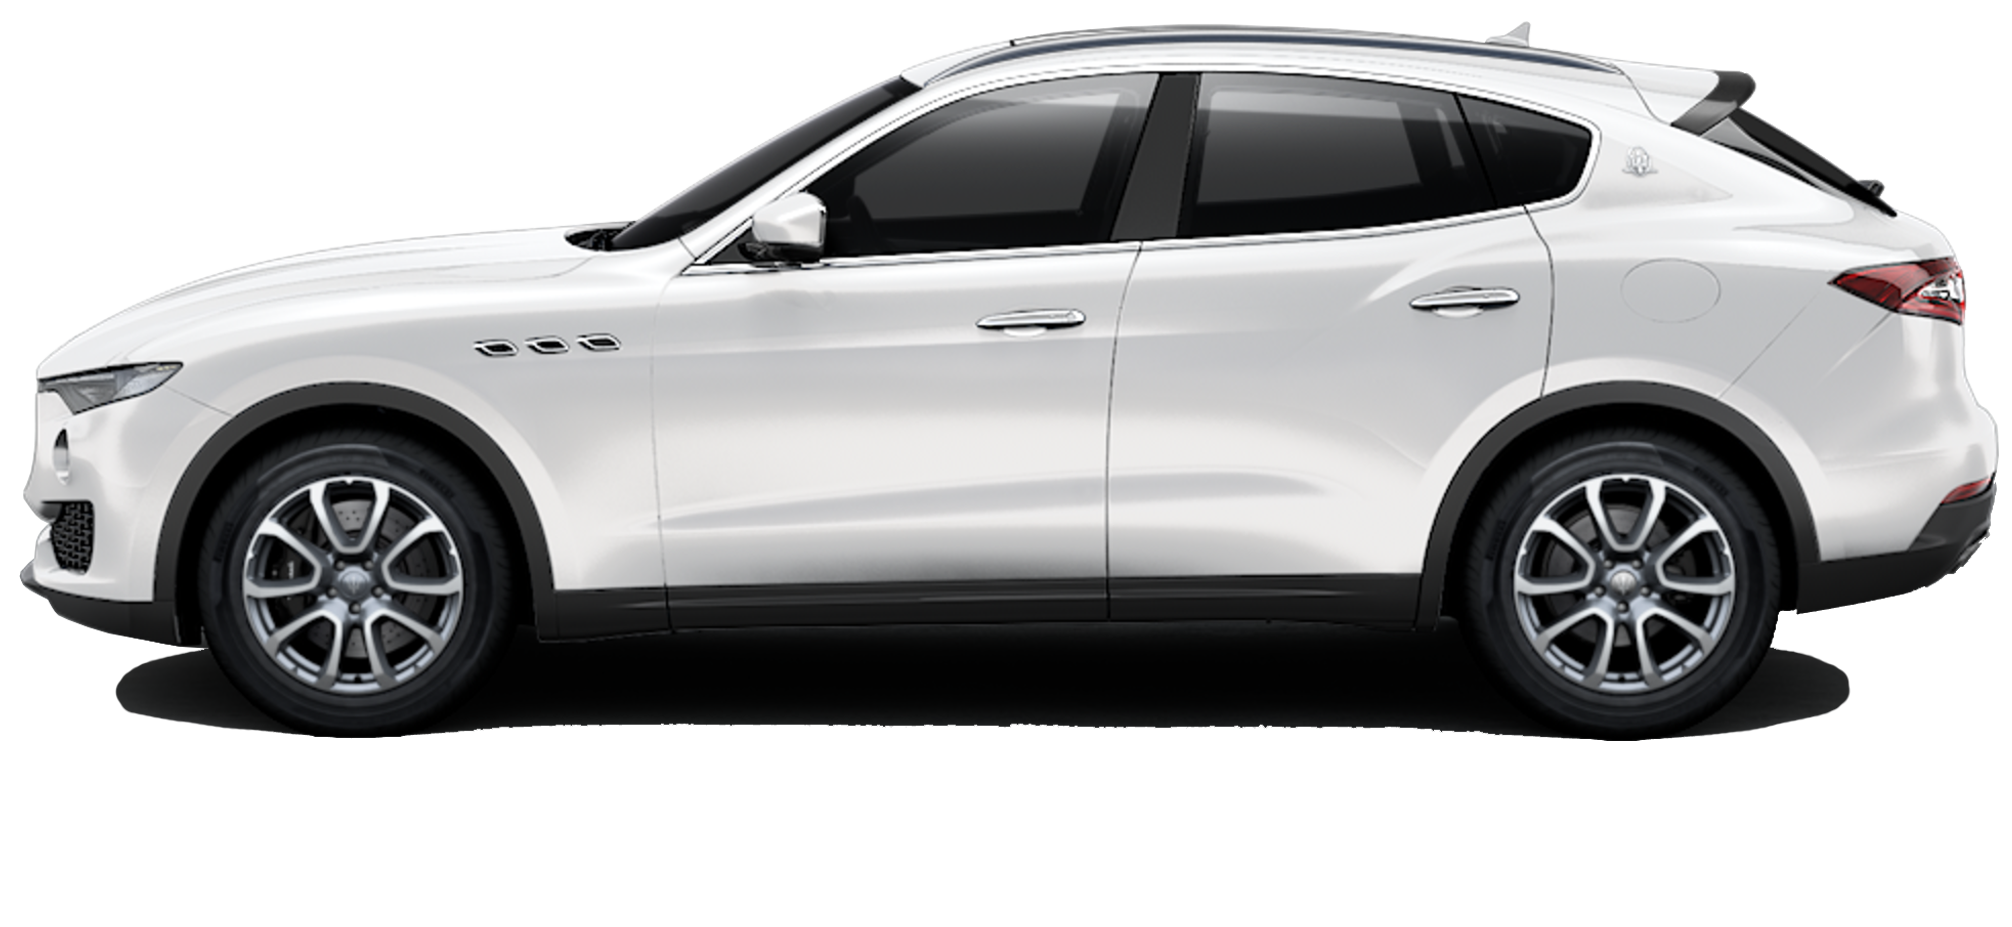 Morrie's Luxury Auto | Luxury Auto Dealer in Golden Valley, MN